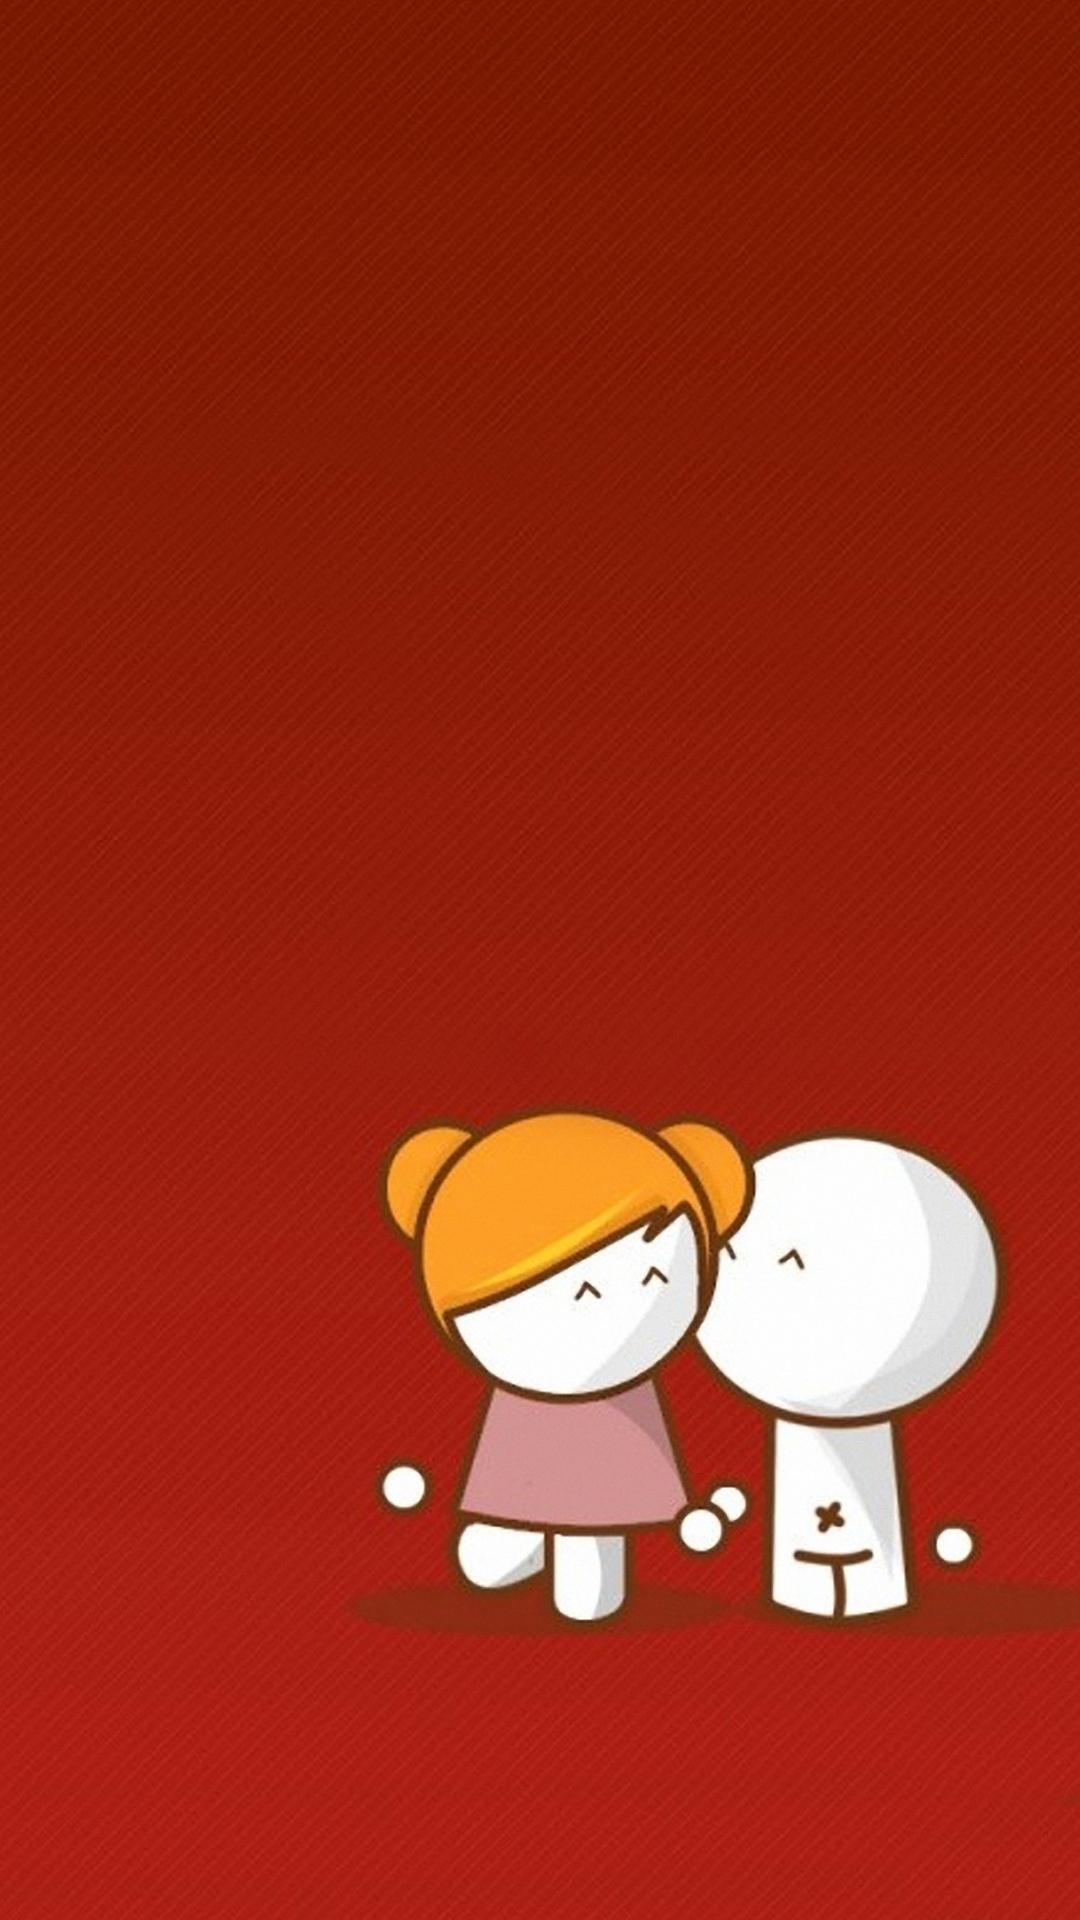 Cartoon Couple Wallpaper With Quotes Free Cartoon Iphone Backgrounds Pixelstalk Net